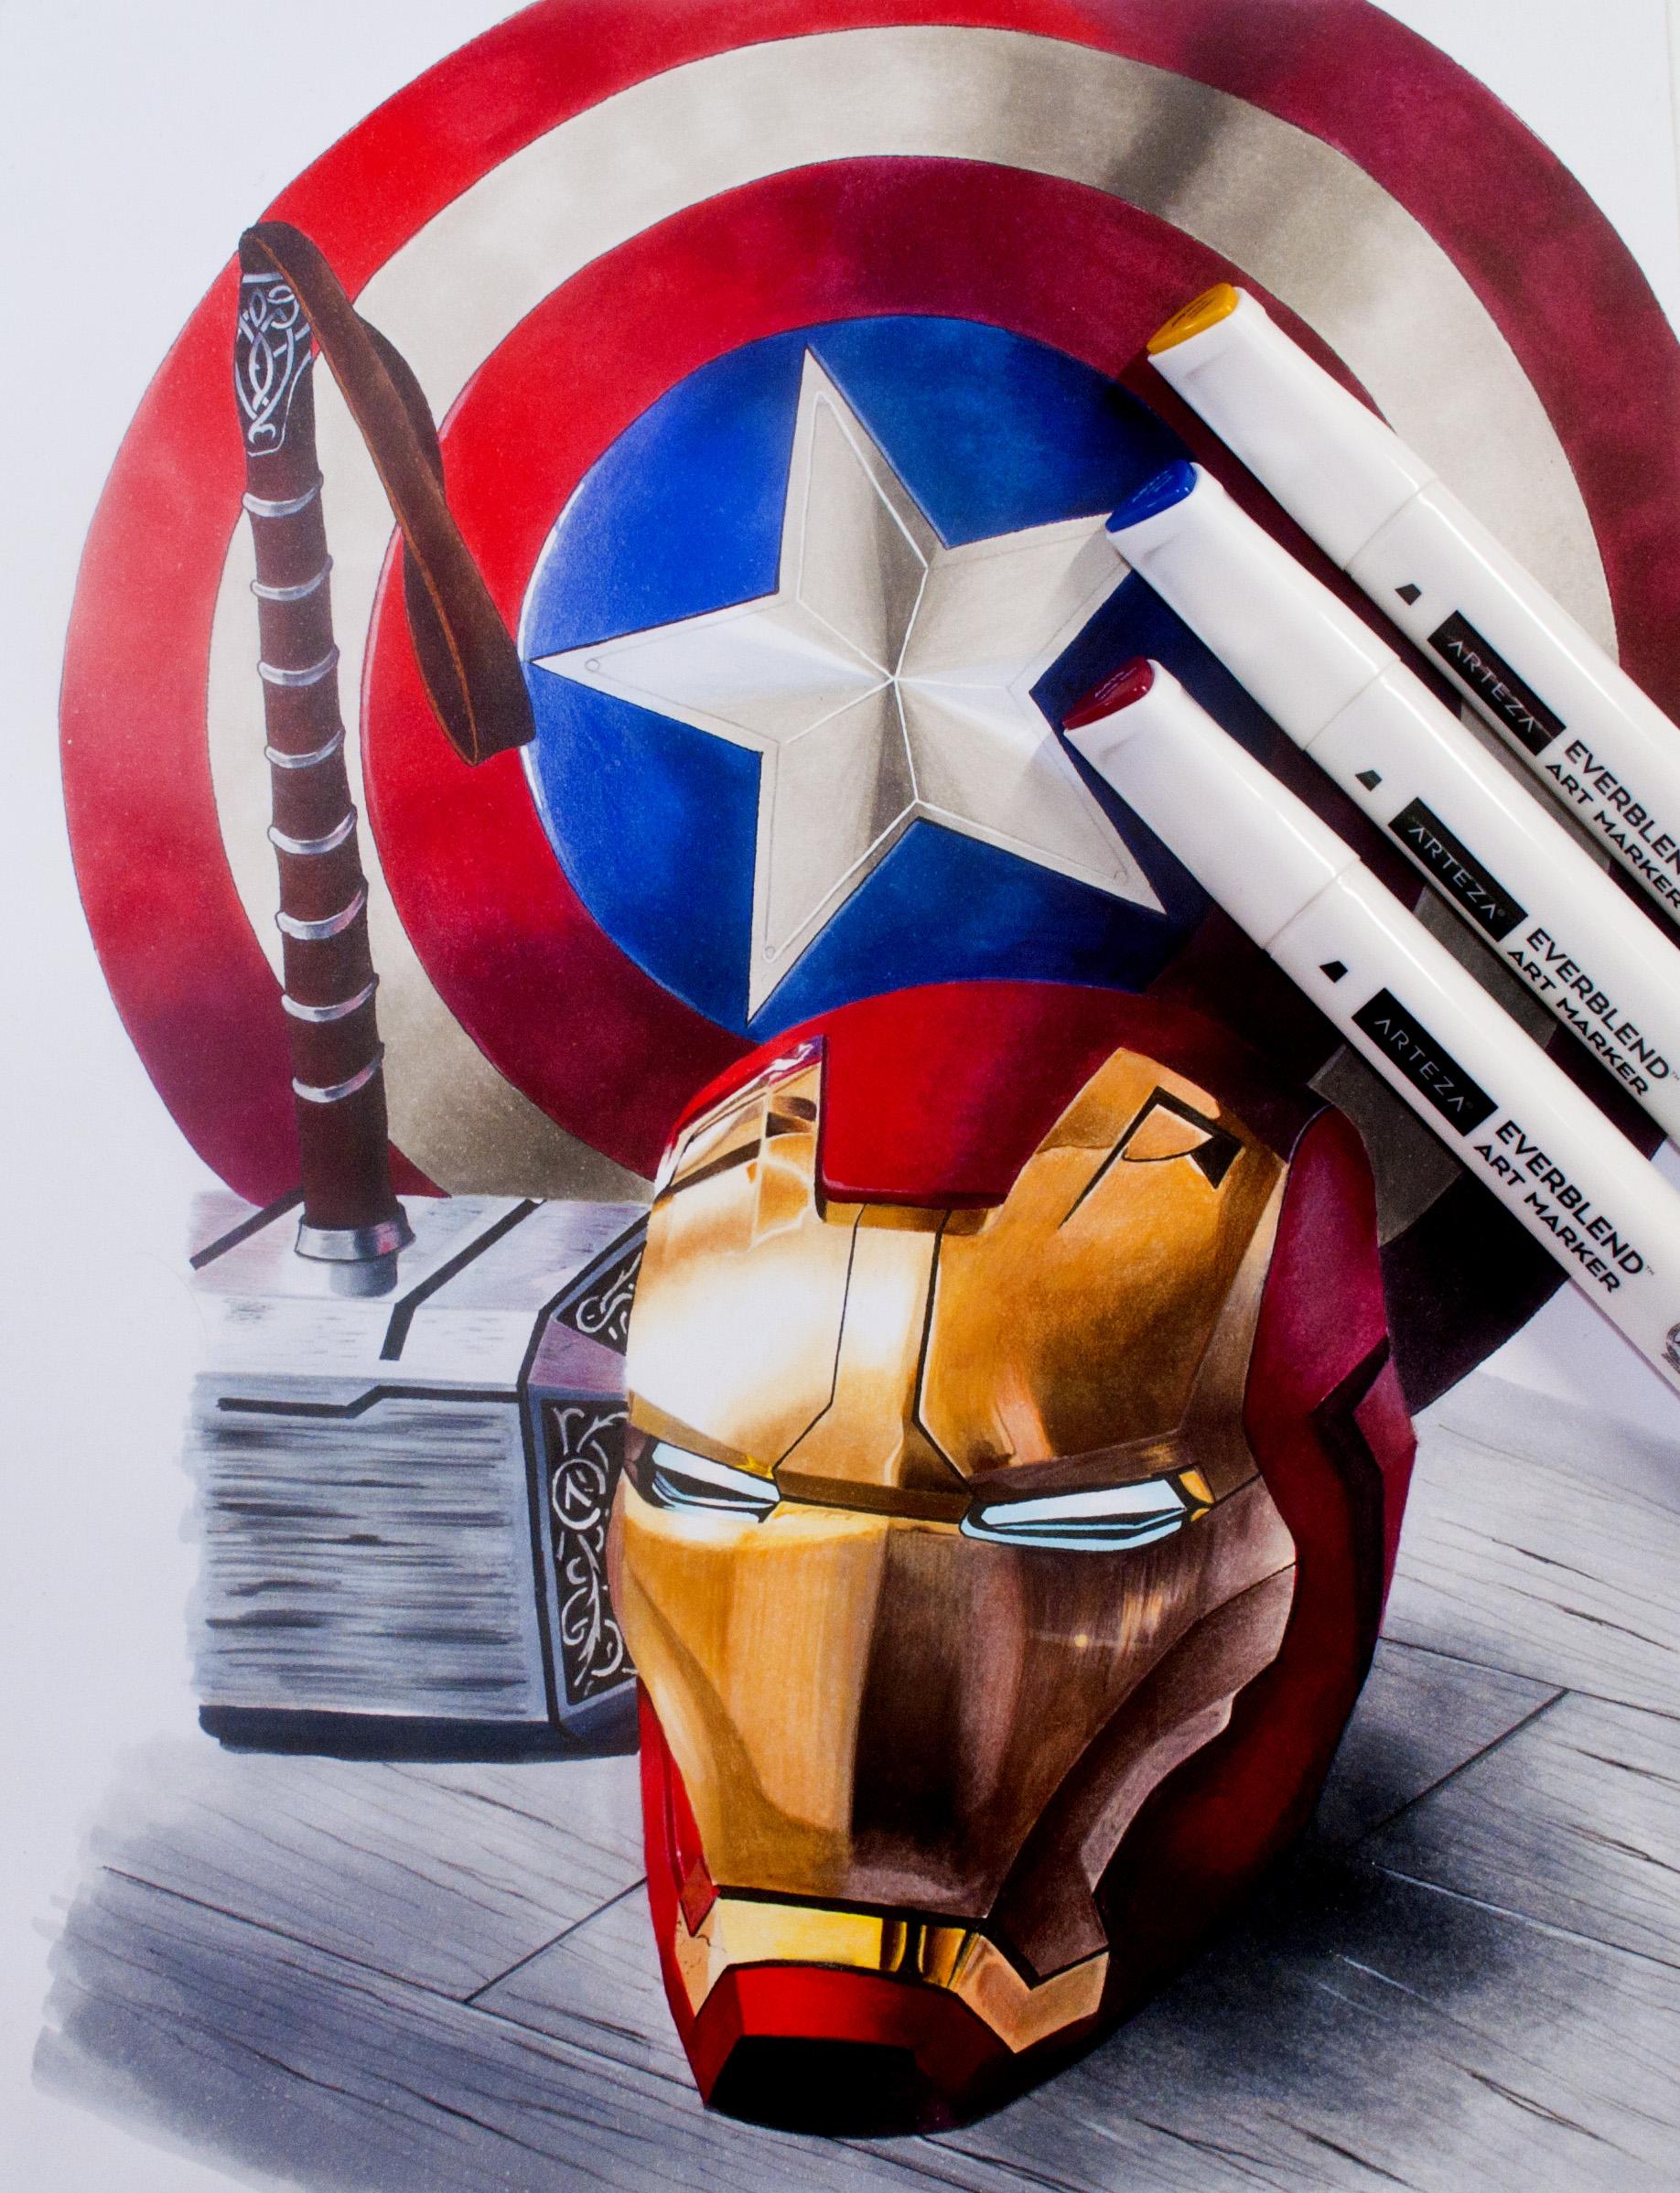 Marvel Image With Arteza Markers.jpg